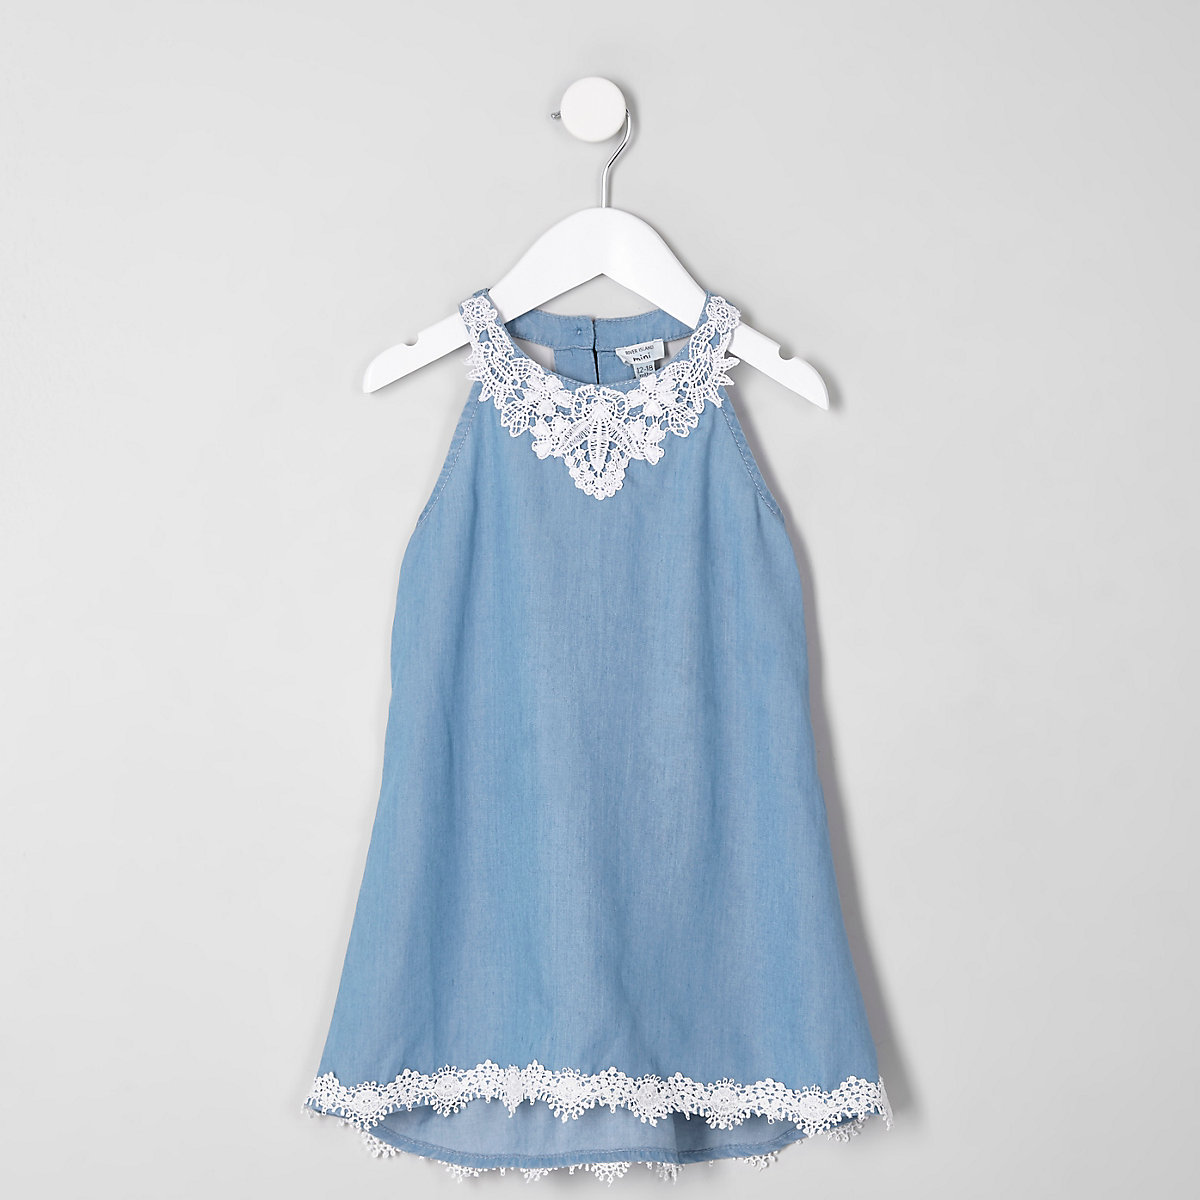 942c7aad41 Mini girls lace denim trapeze dress - Baby Girls Dresses - Mini Girls -  girls